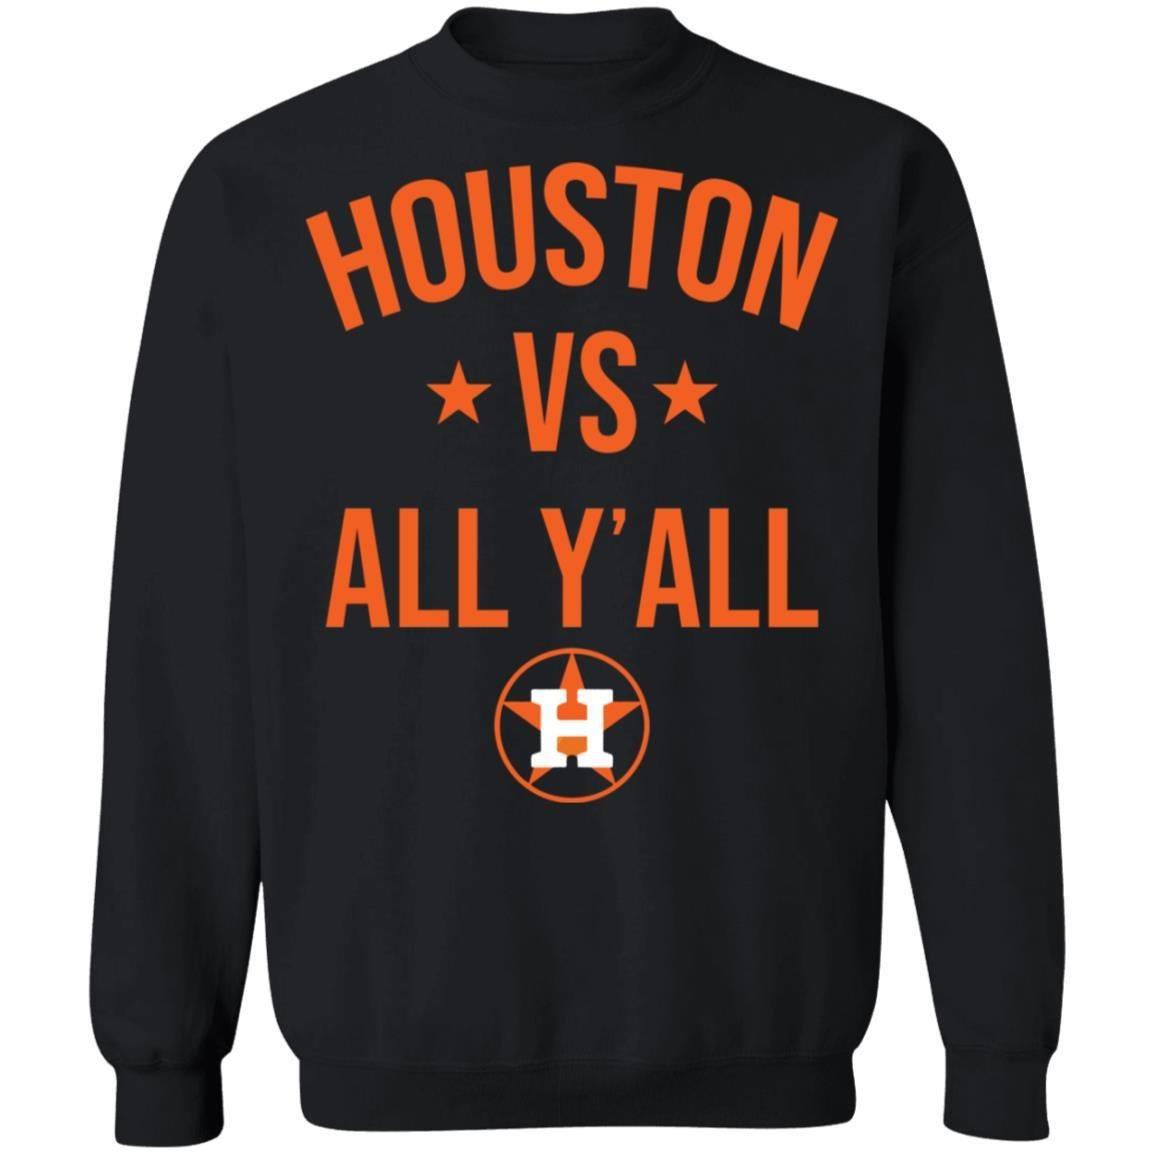 Houston Astros Vs All Y'all Shirt